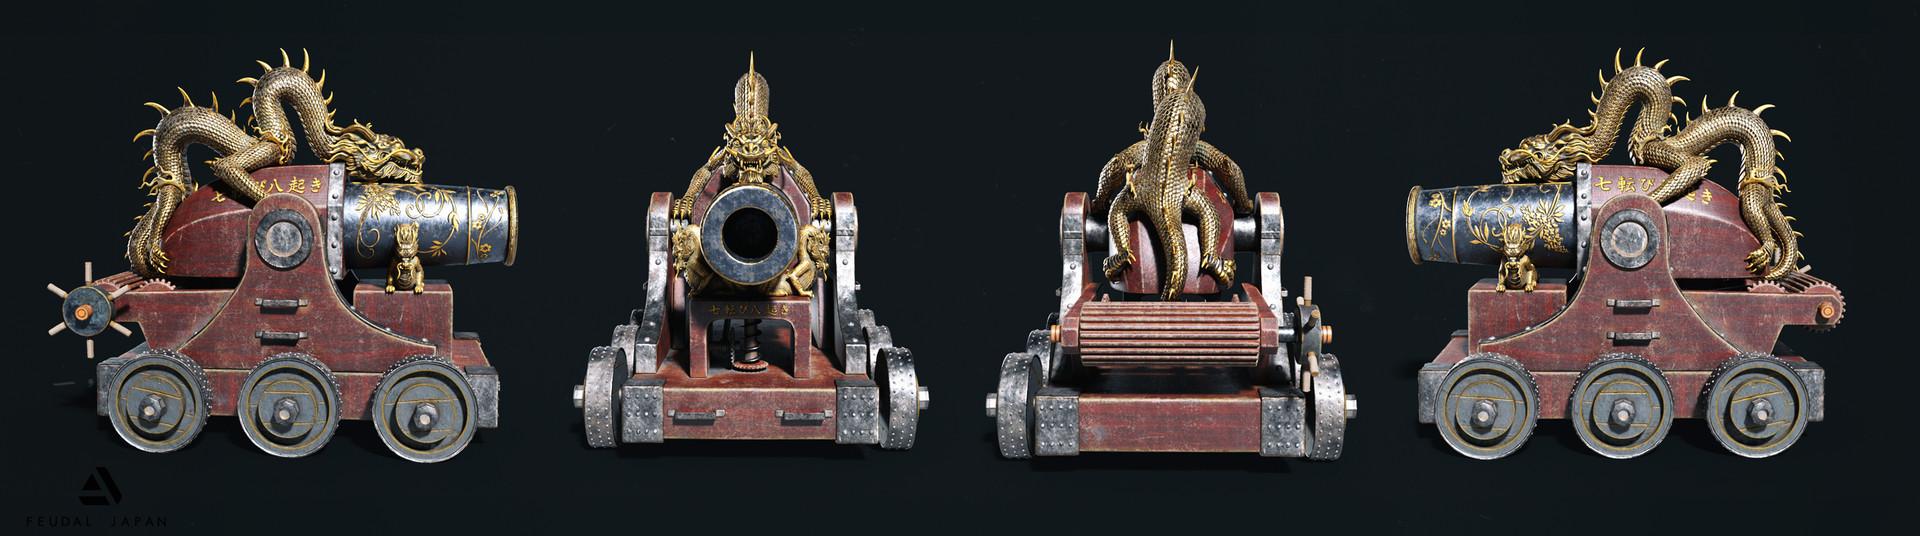 Riyx hasan cannonstill 06